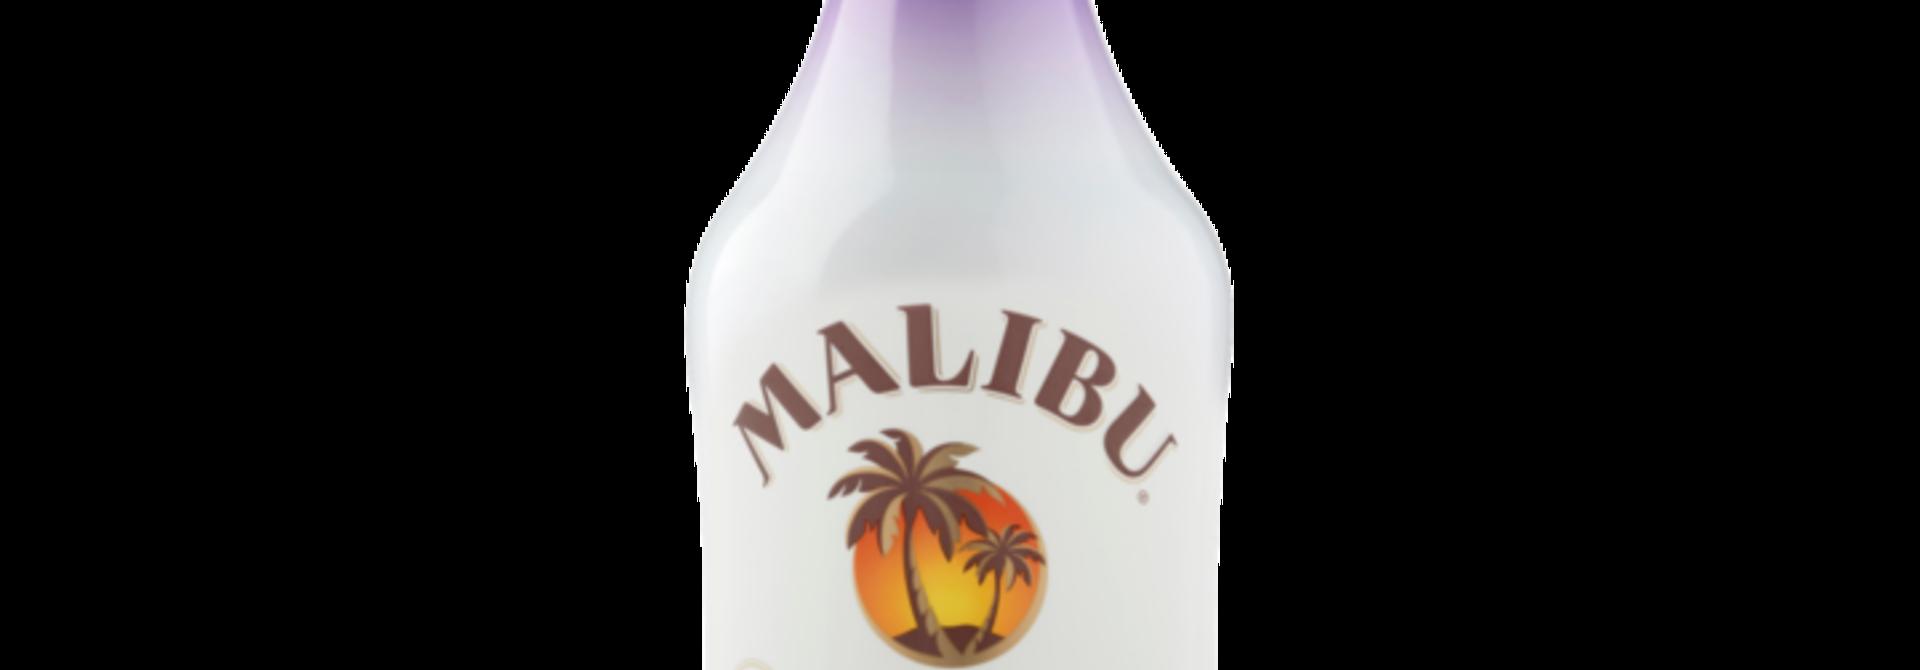 Malibu Passionfruit 70cl